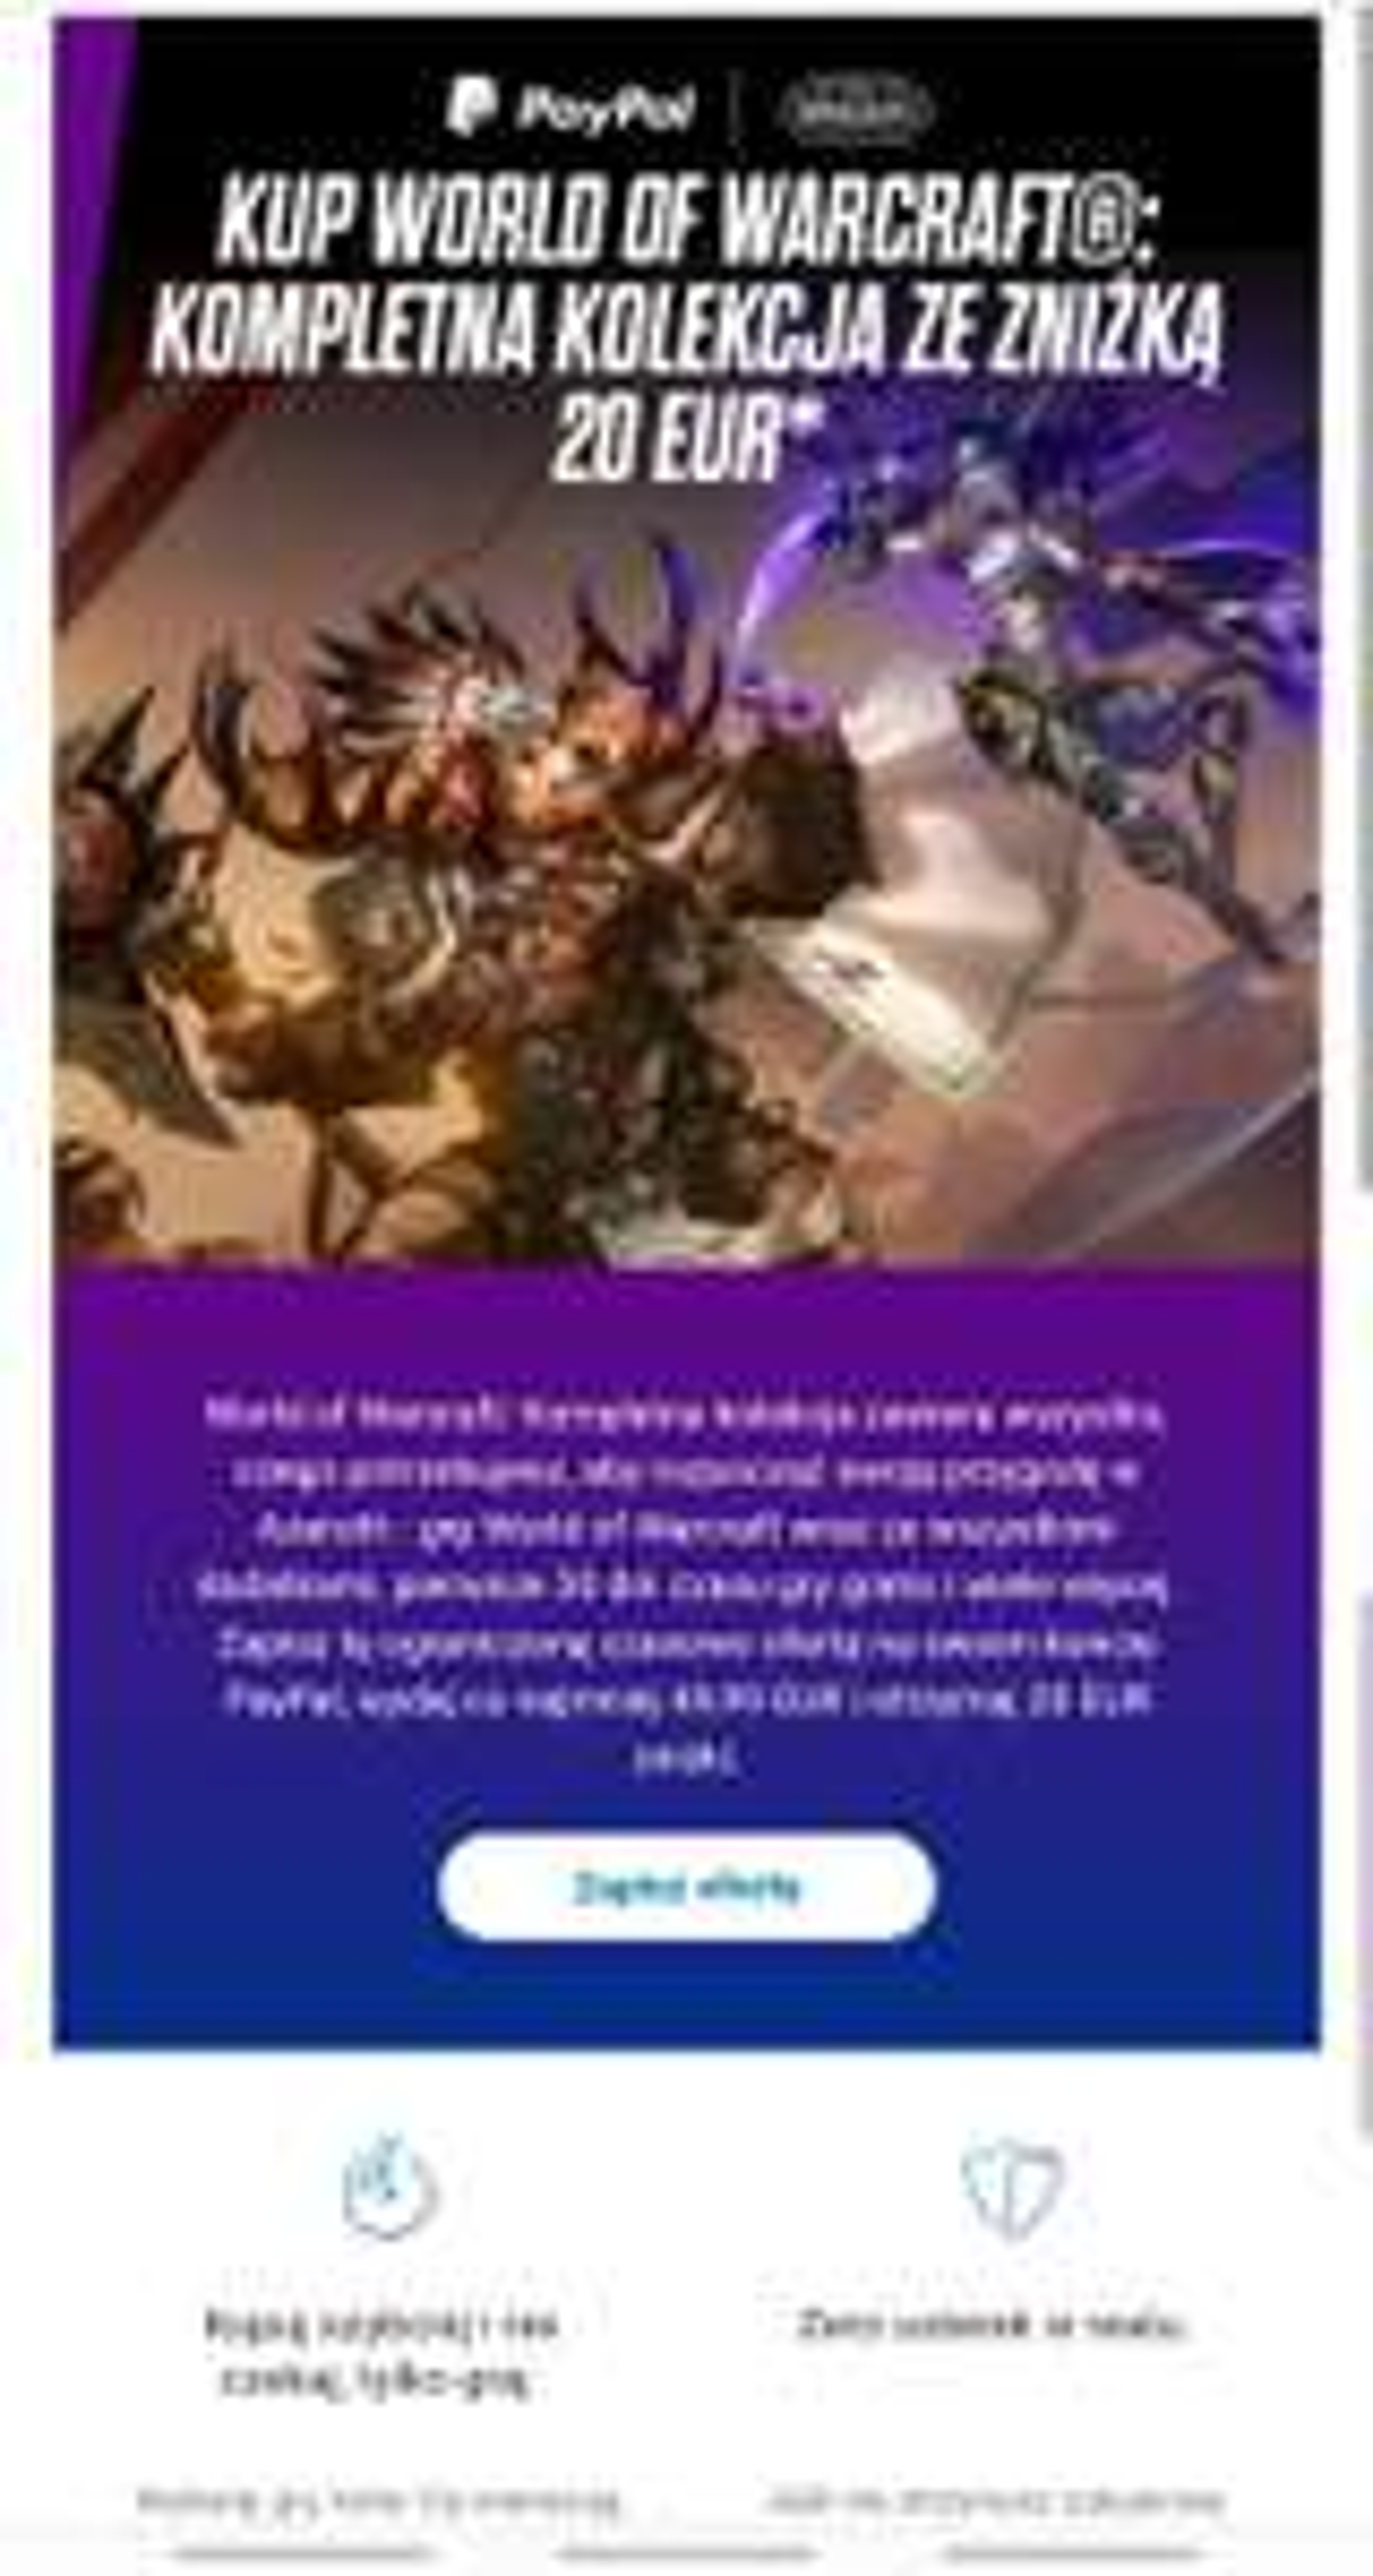 World of Warcraft®: Kompletna kolekcja –  20 EUR taniej płacąc PayPal |MWZ 49.99 EUR